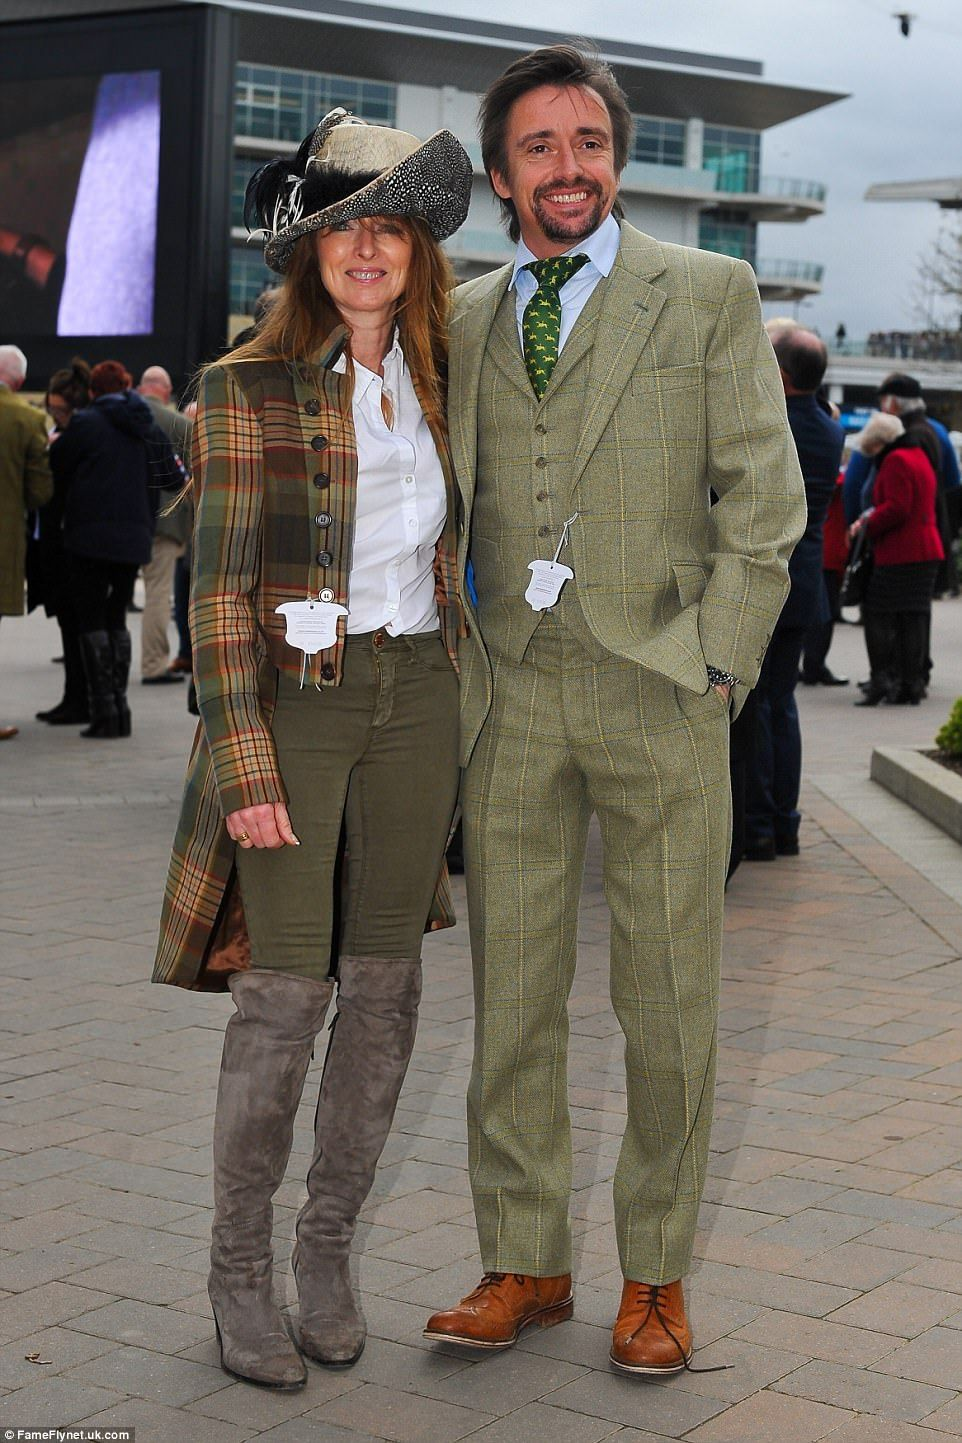 Glamorous Racegoers Arrive For The First Day At Cheltenham Race